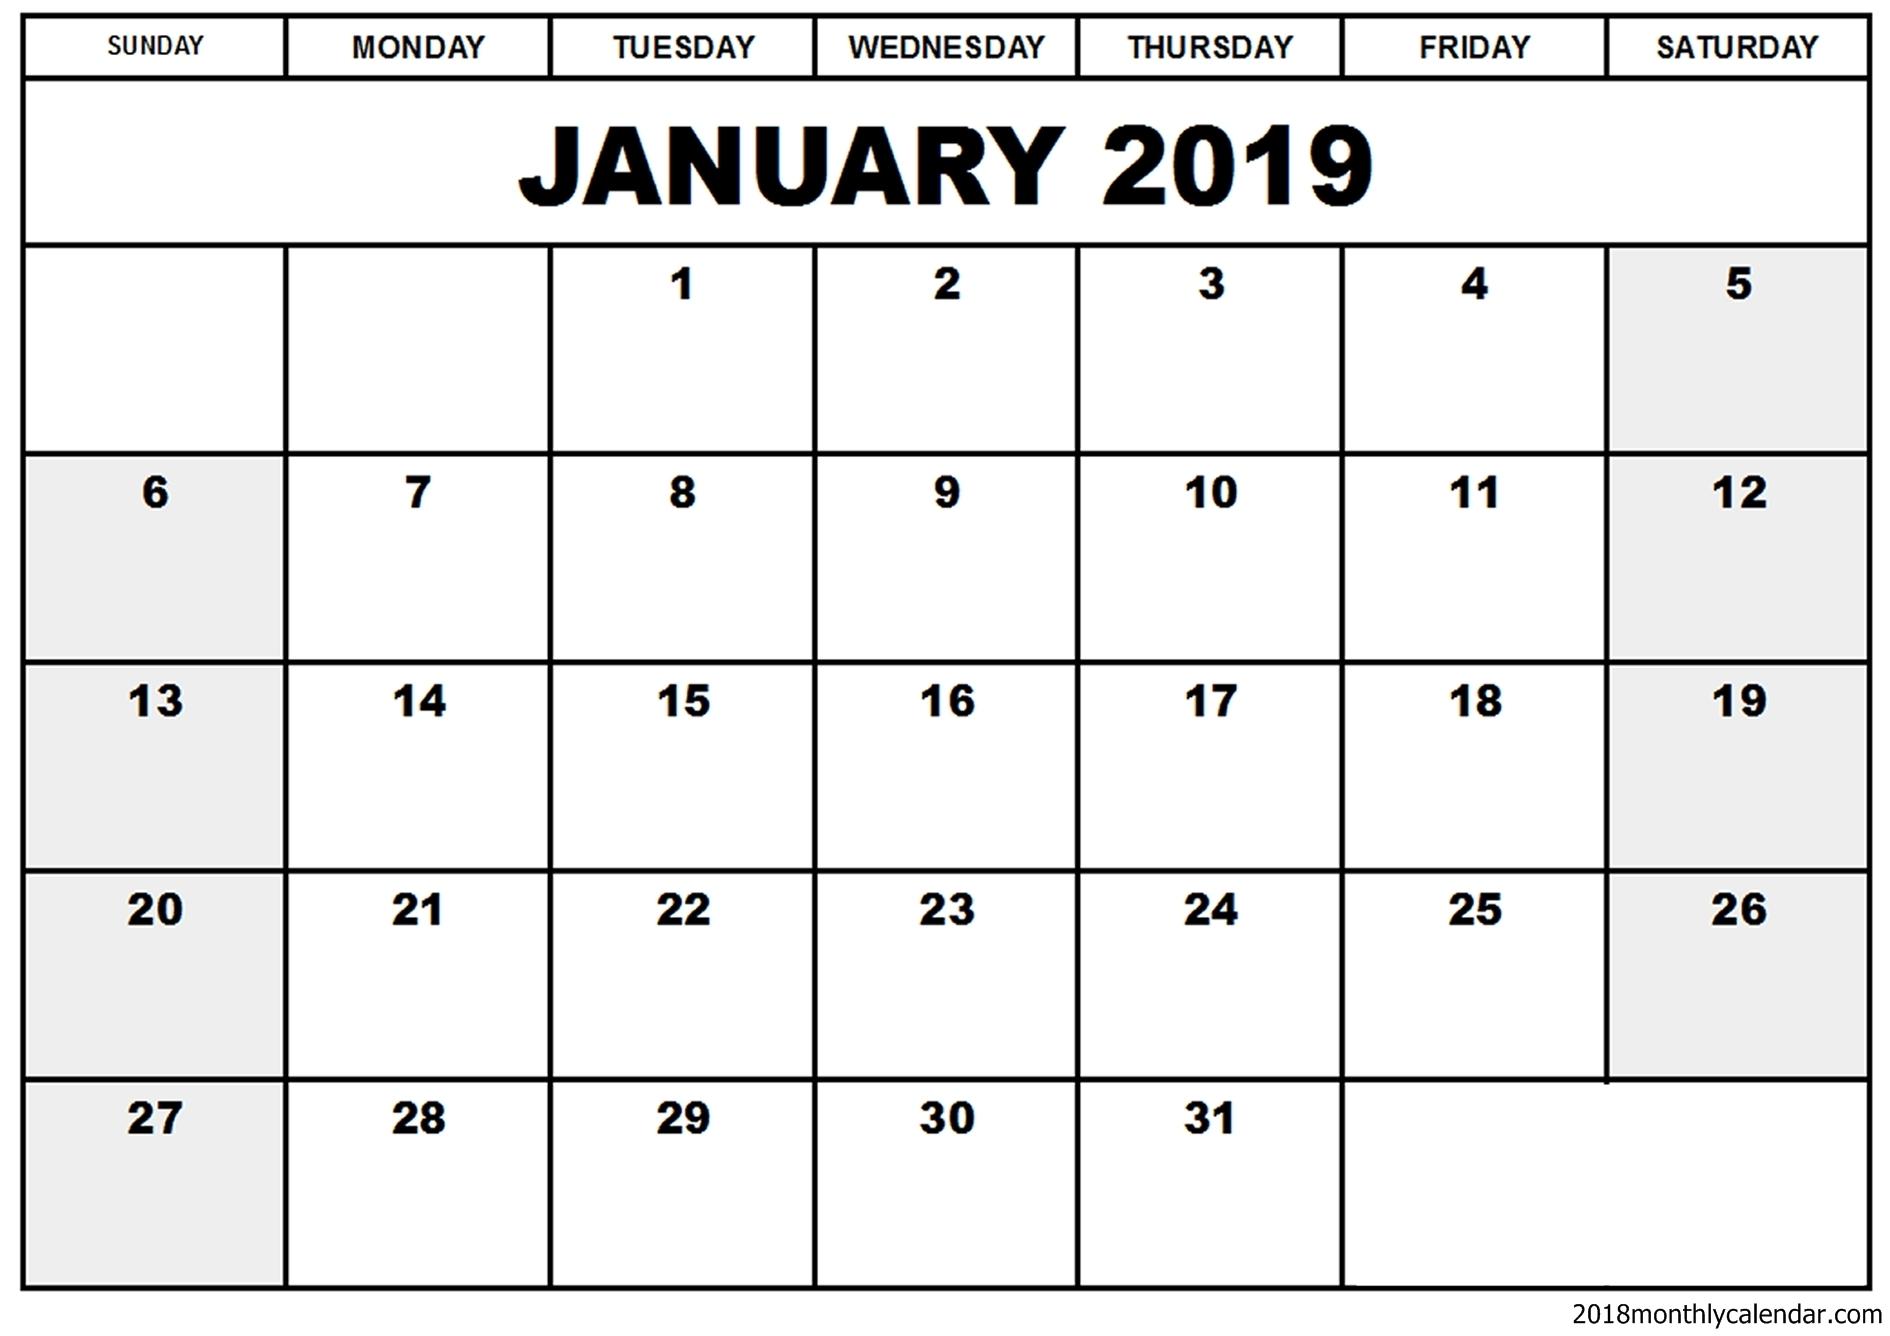 January 2019 Editable Calendar Printable - Free Printable Calendar intended for Free Fillable Blank Calendar Templates